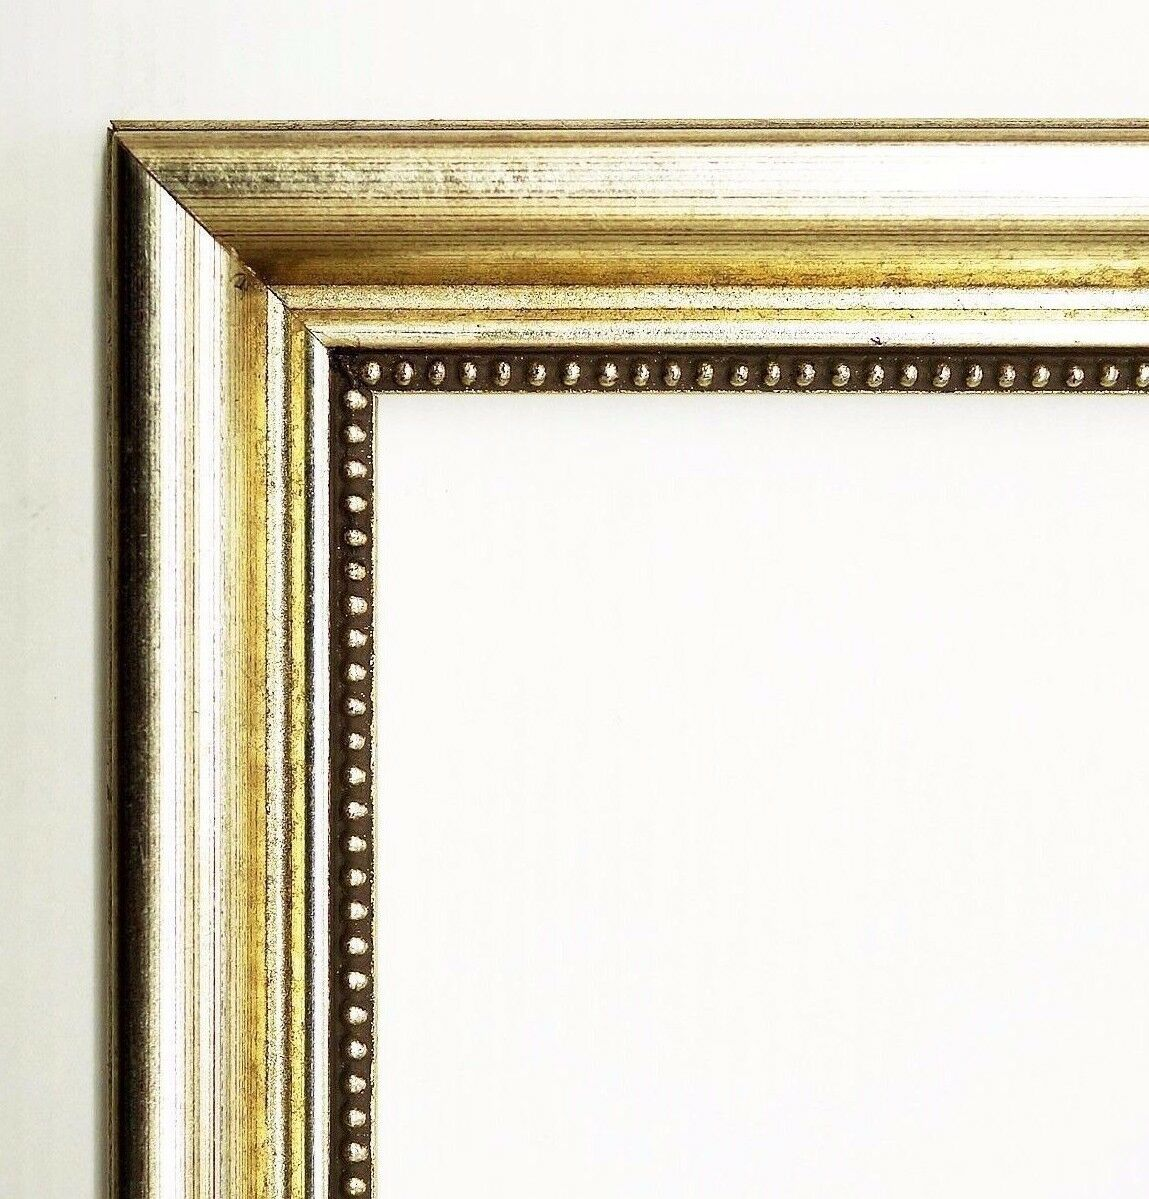 bilderrahmen silber antik barock rahmen foto clever line 5 2, 8